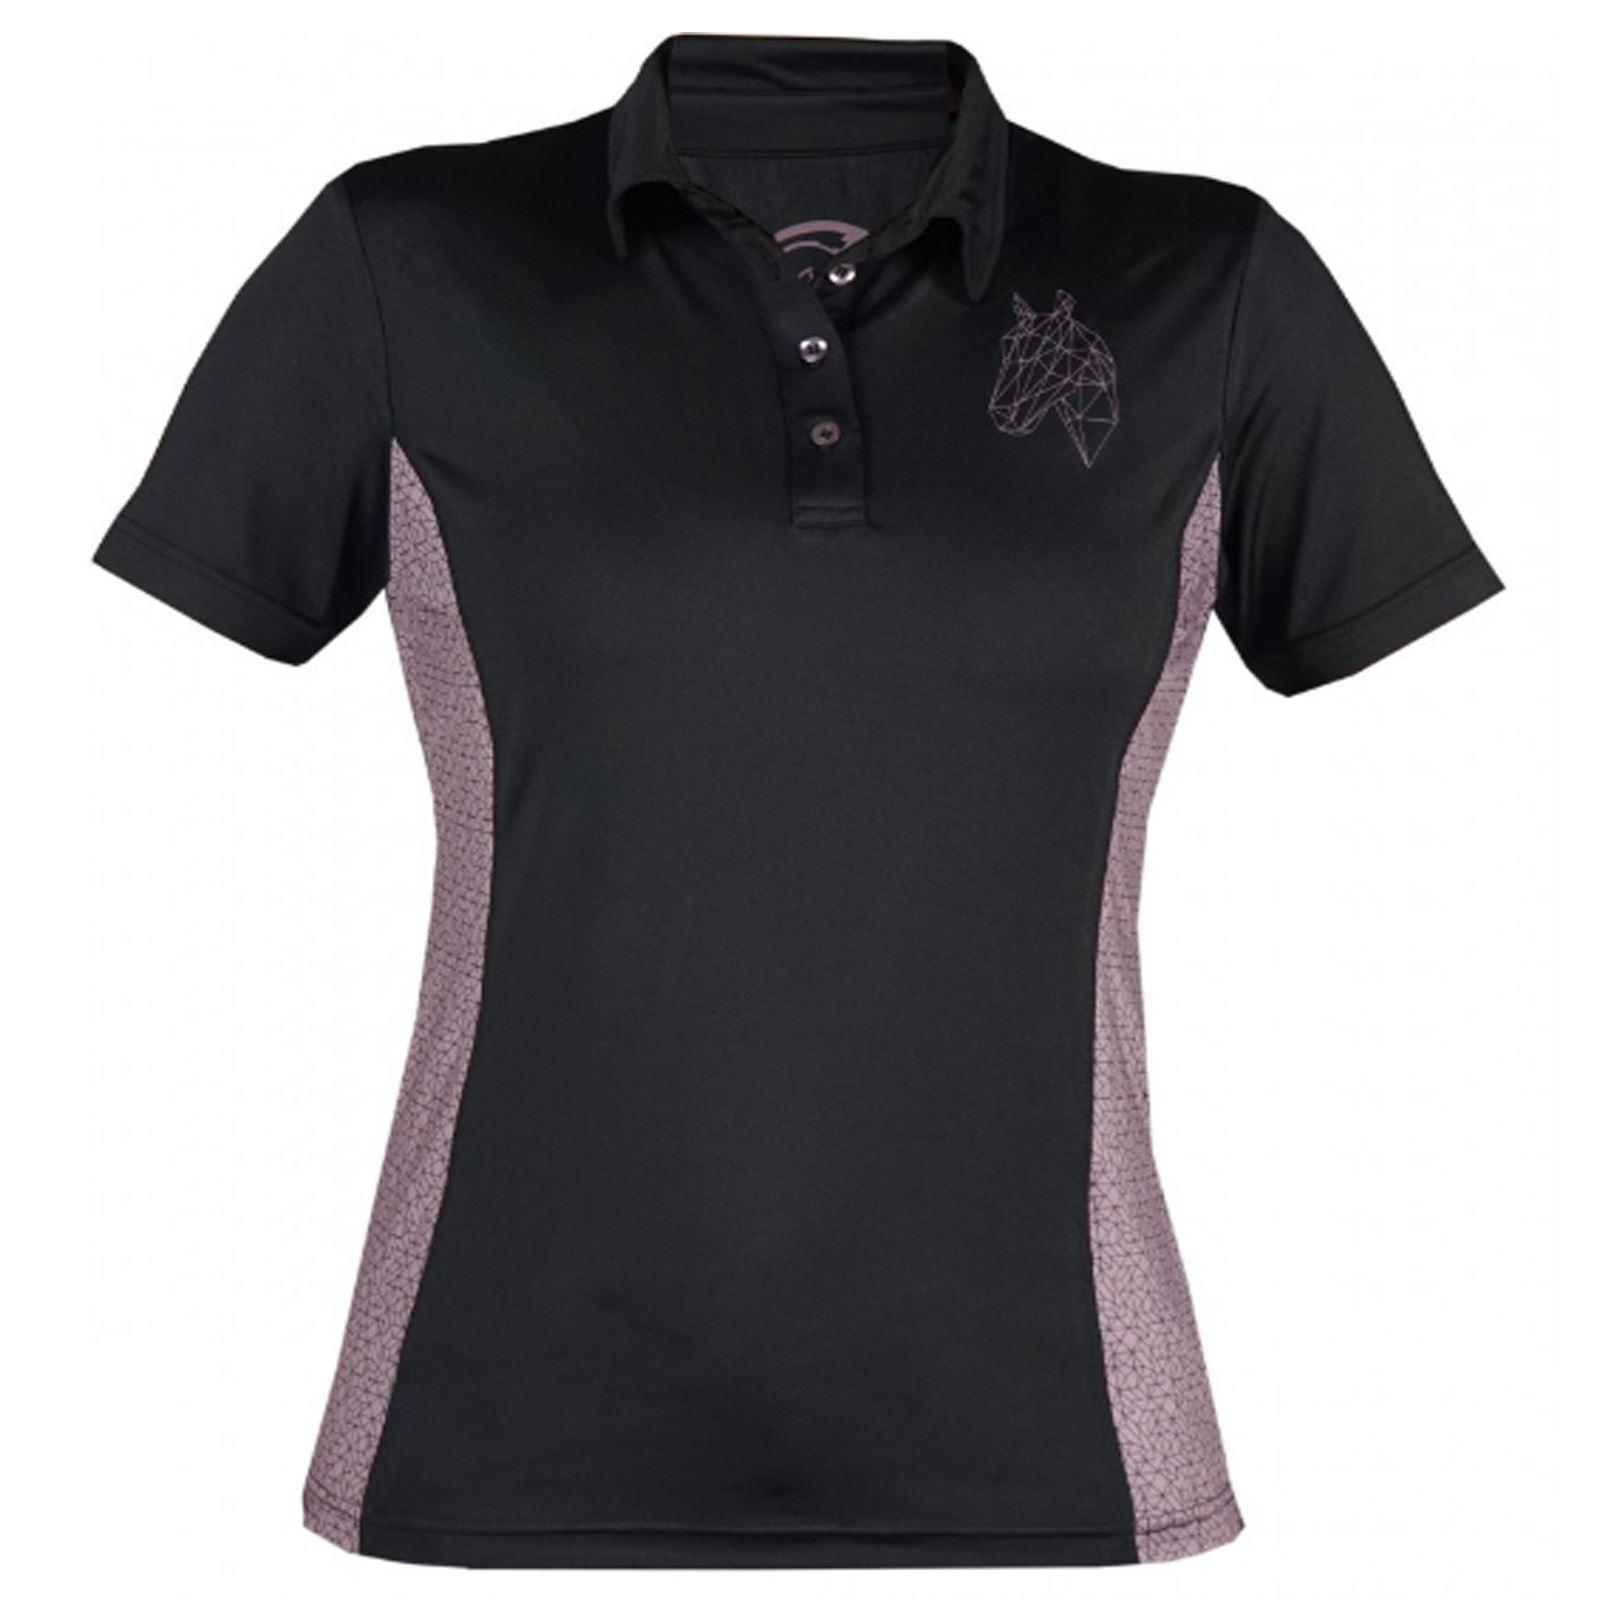 Horka Lyra Polo Shirts - Ladies Horse Riding Comfortable Stable Yard Breathable